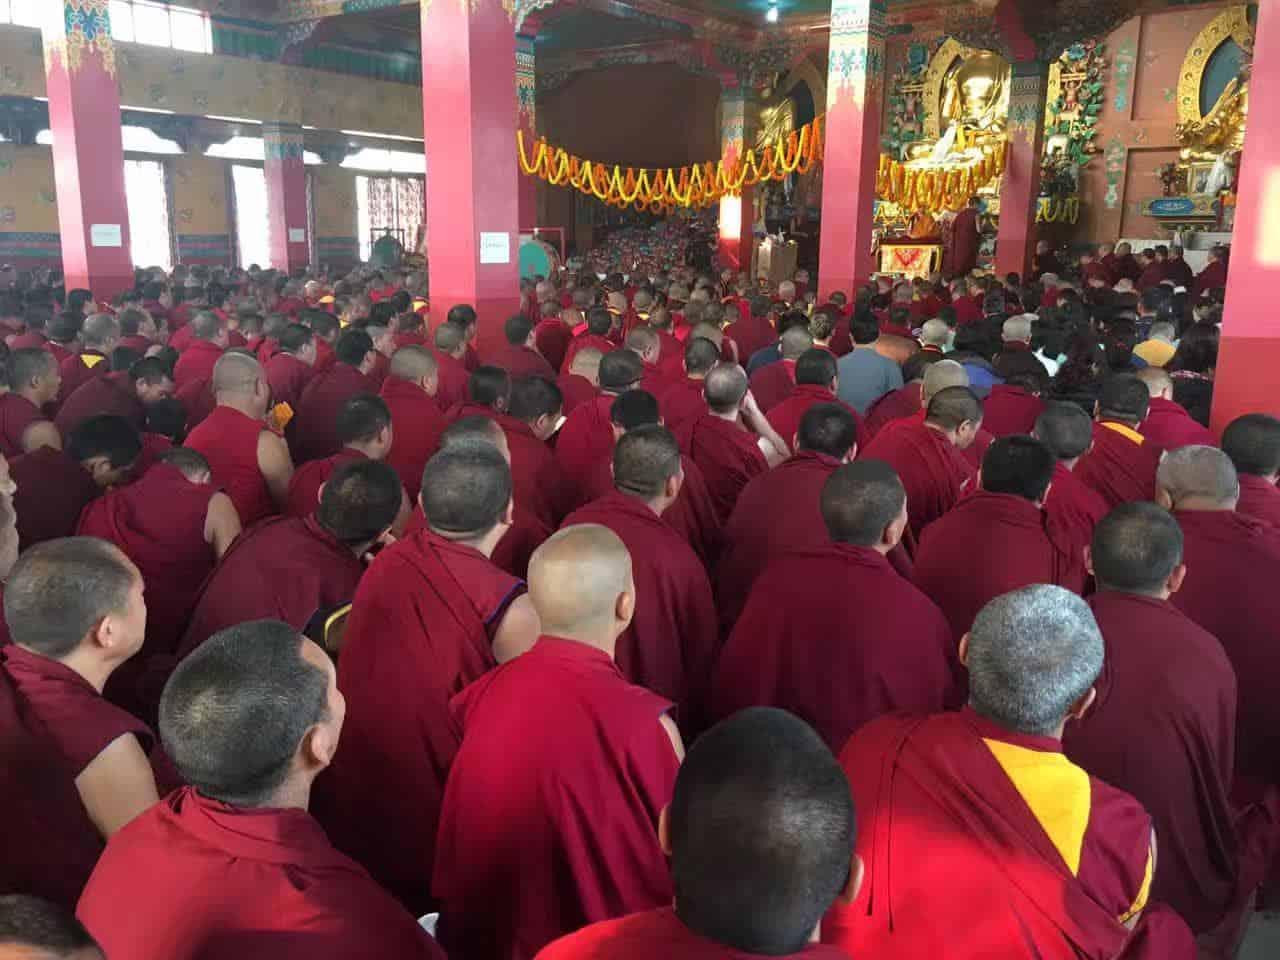 Gosok Rinpoche India 2017 longlife 0642b3f385ec3c12e7050ee2afeac16